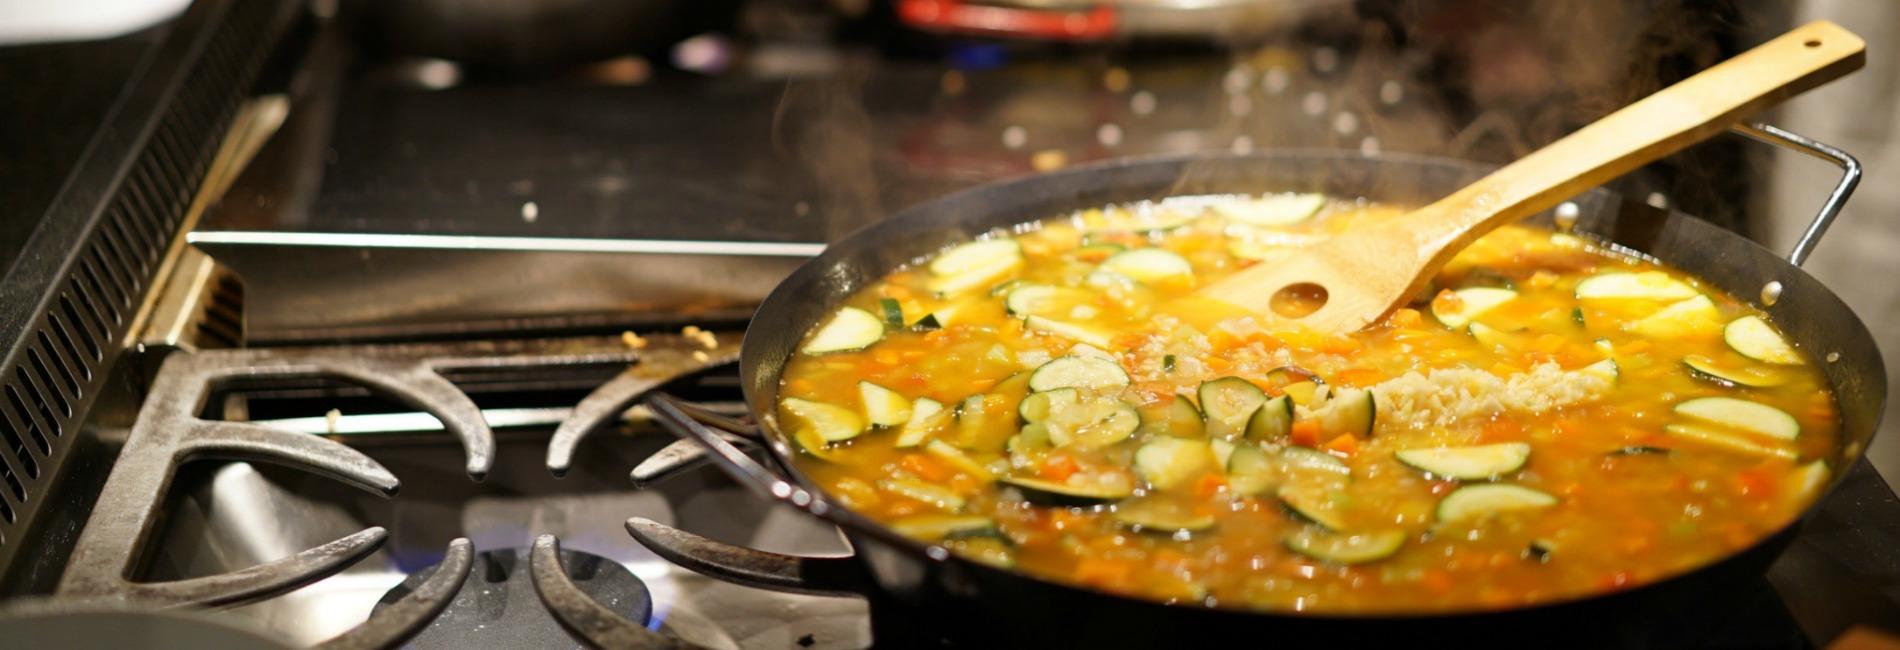 Pan of veggies on a black stove